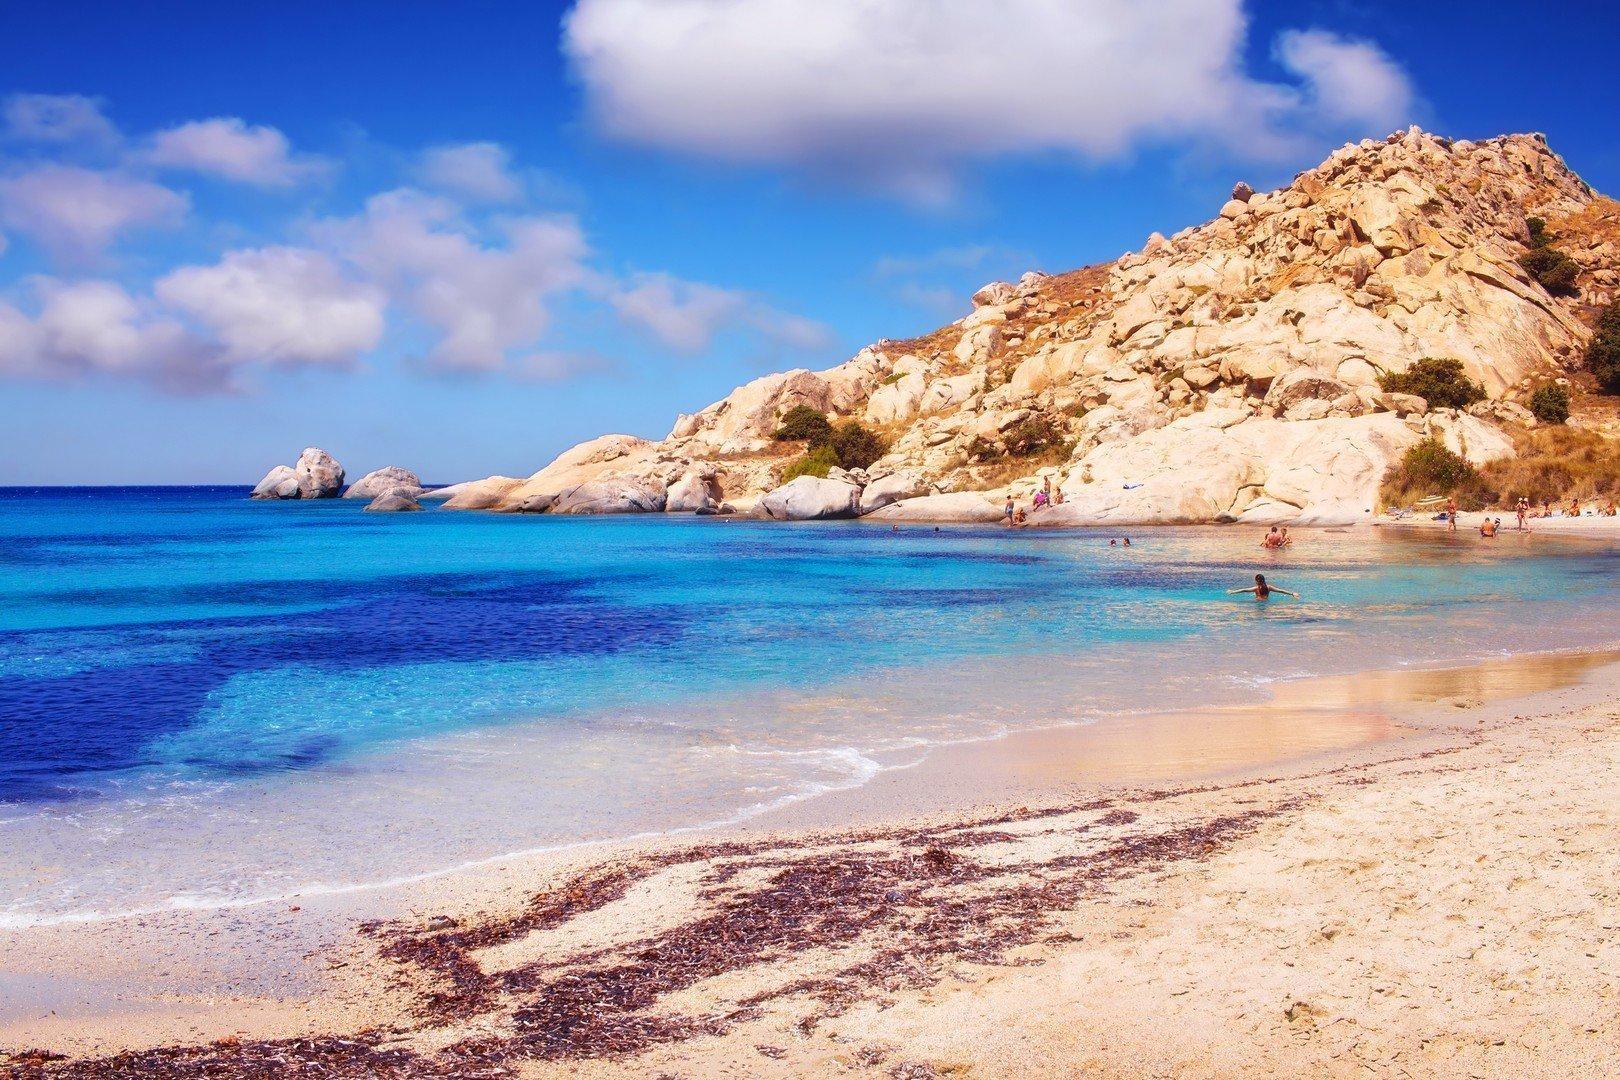 Mikri Vigla beach on Naxos island, Greece shutterstock_508430344